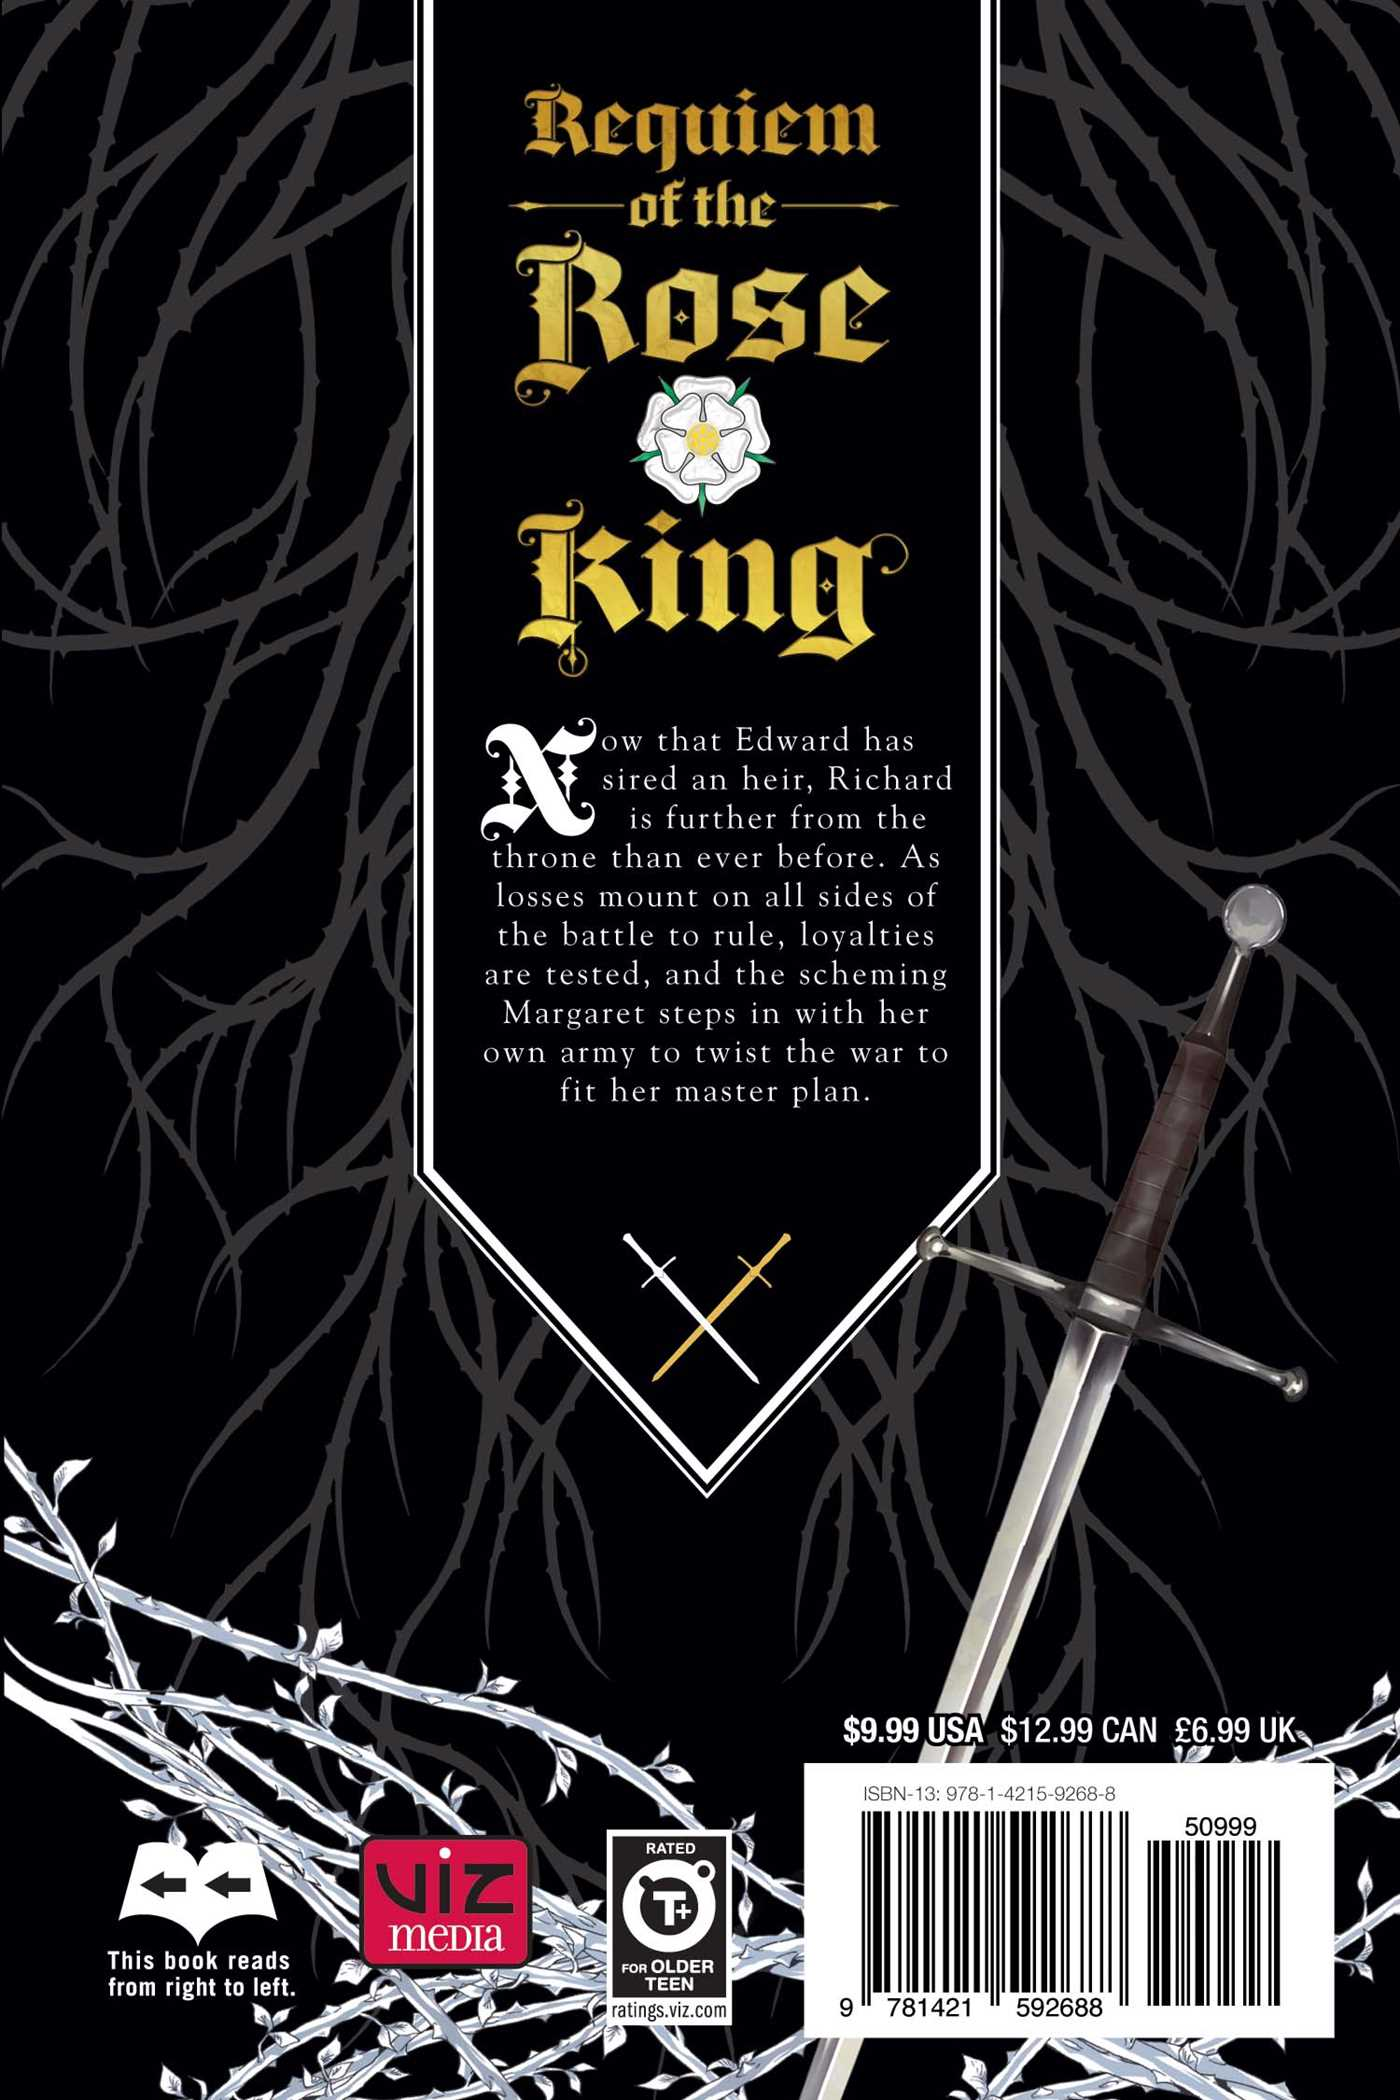 Requiem of the rose king vol 6 9781421592688 hr back